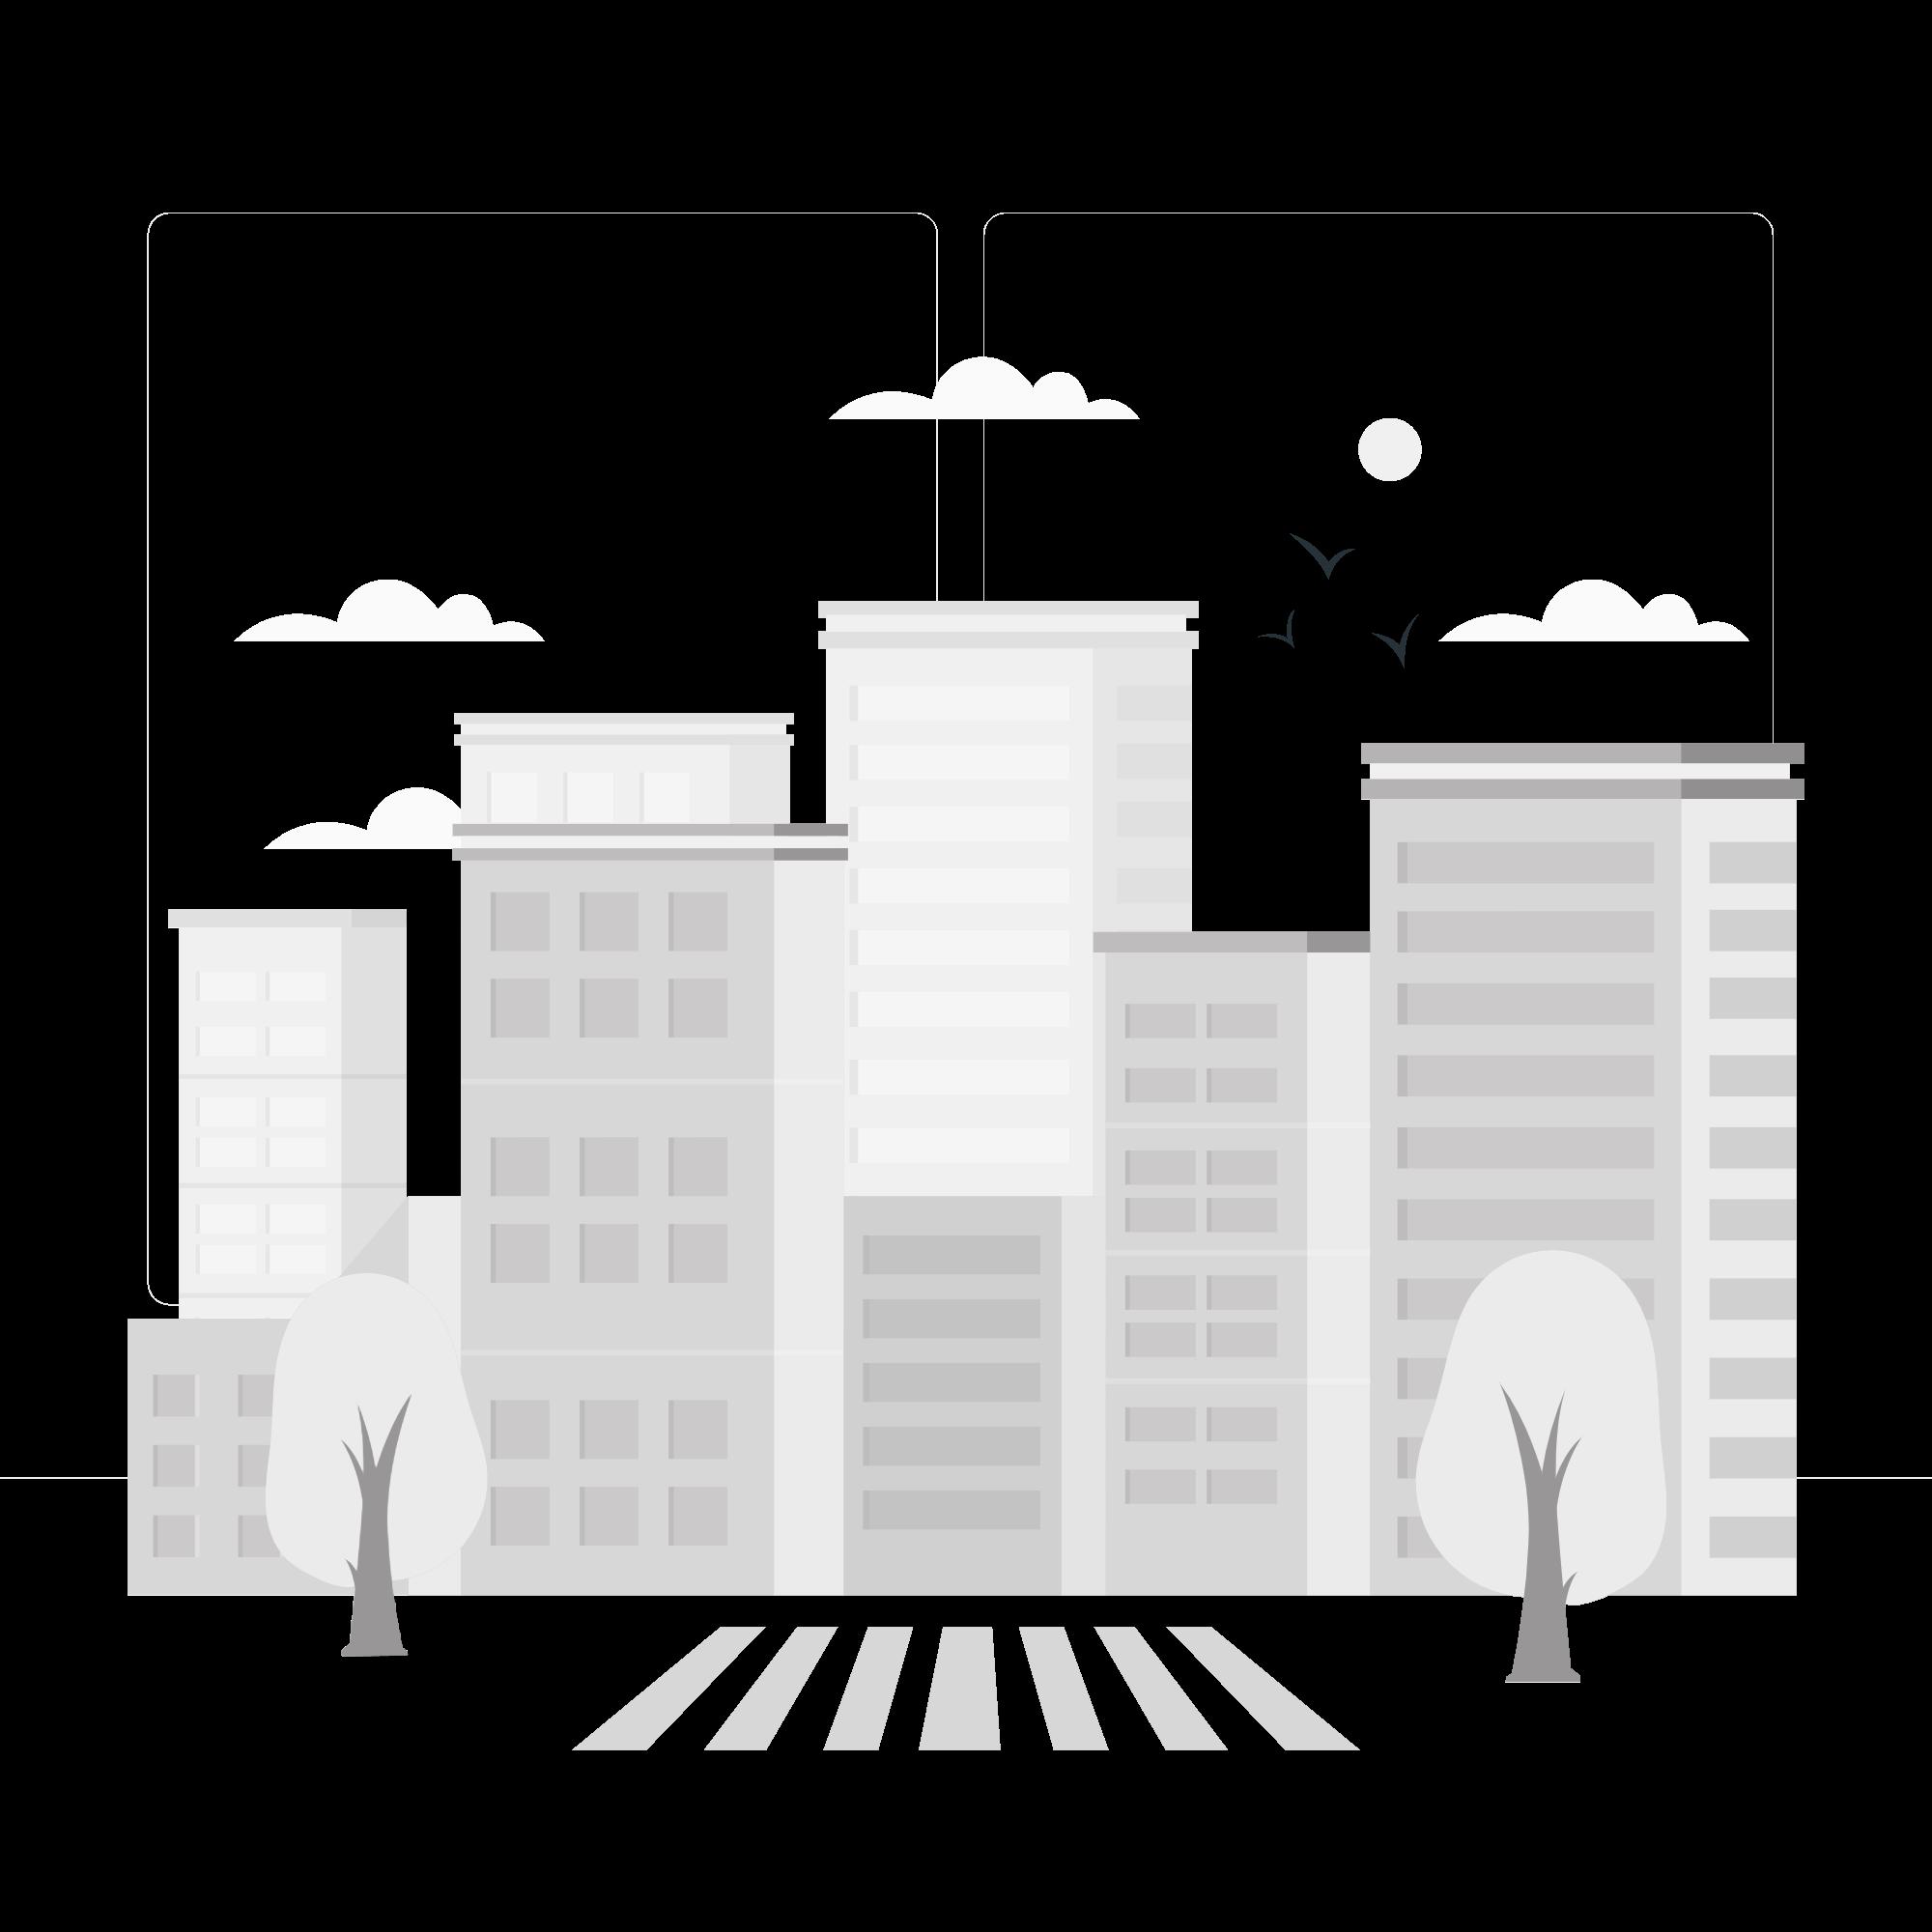 illustration plan local urbanisme dossier plu - Colmar Print